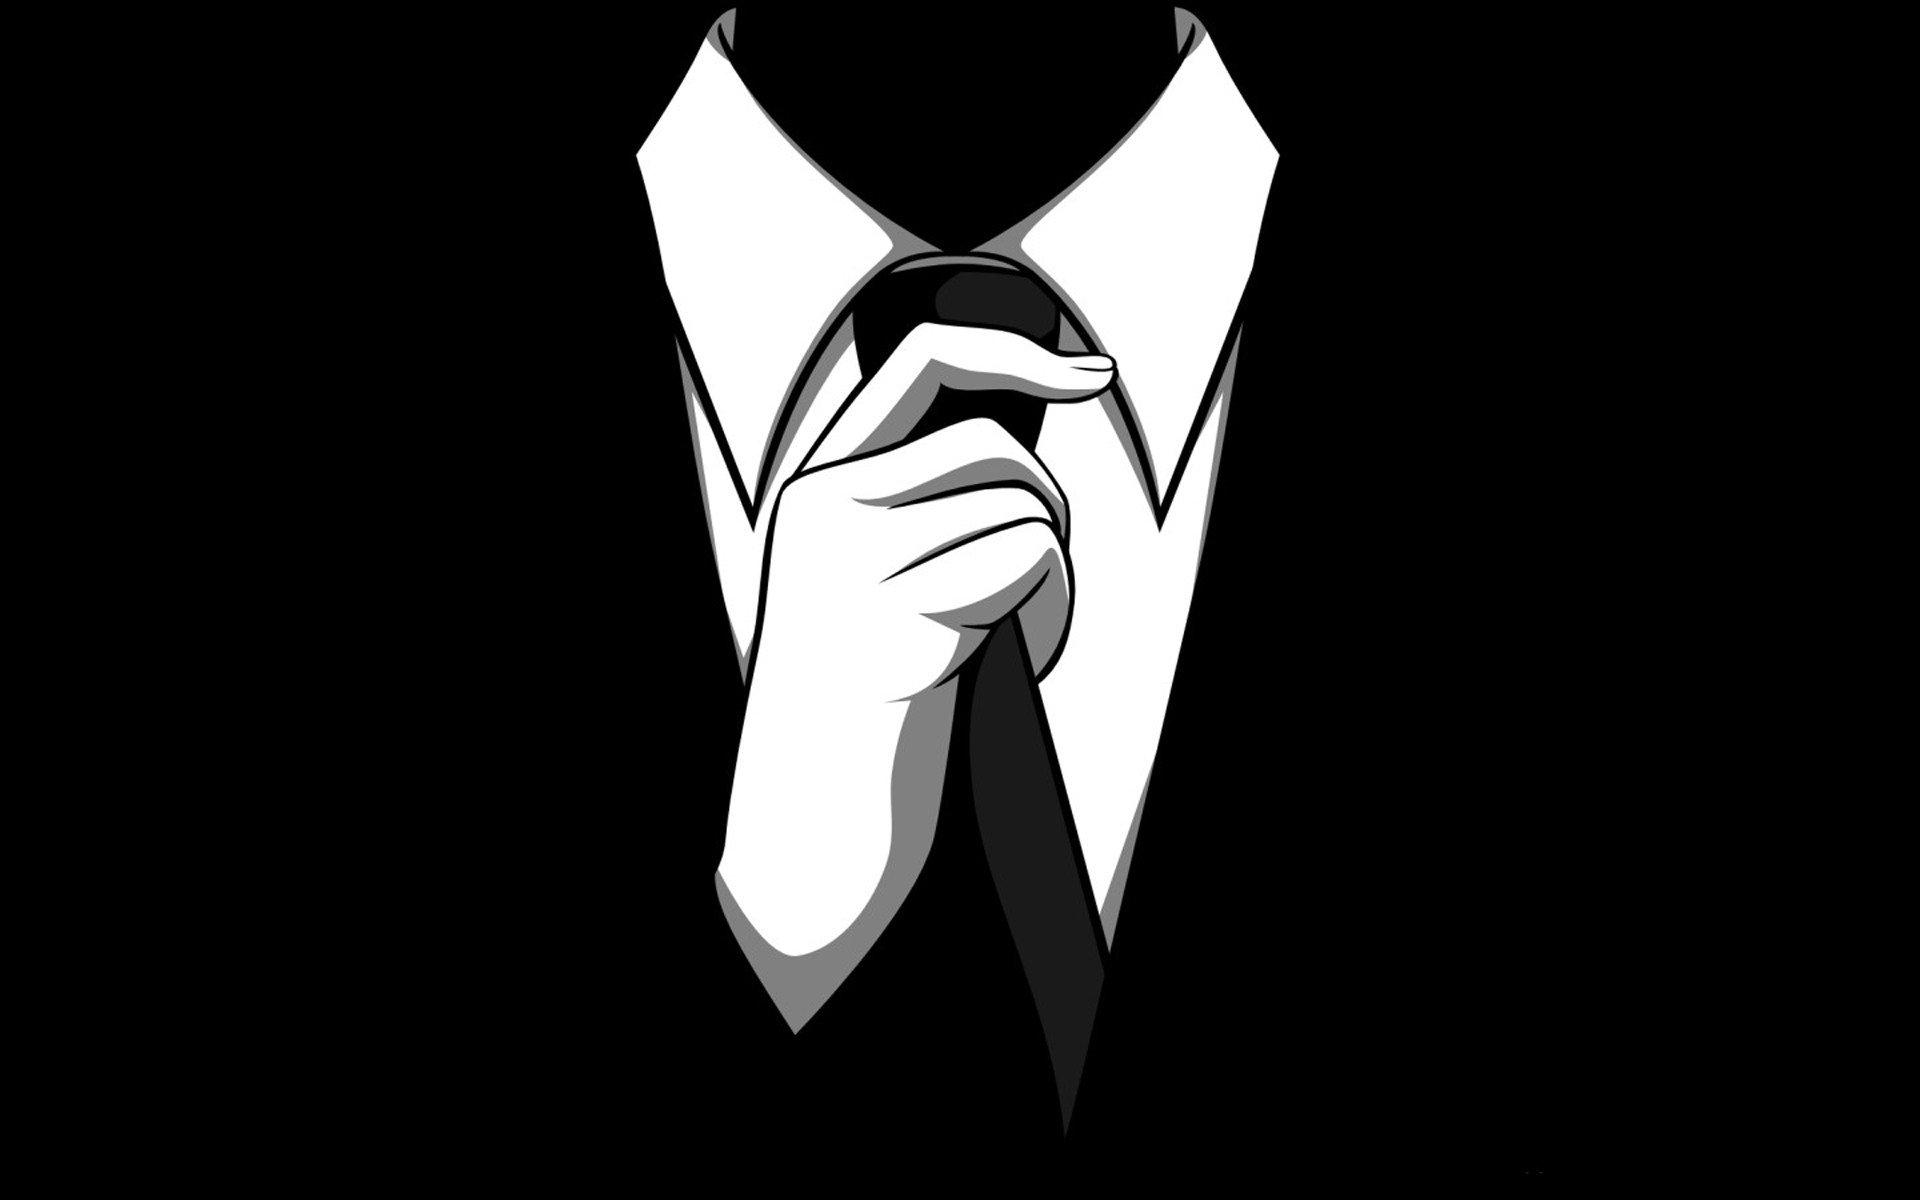 600391-barney-stinson-black-background-how-i-met-your-mother-minimalistic-tie.jpg